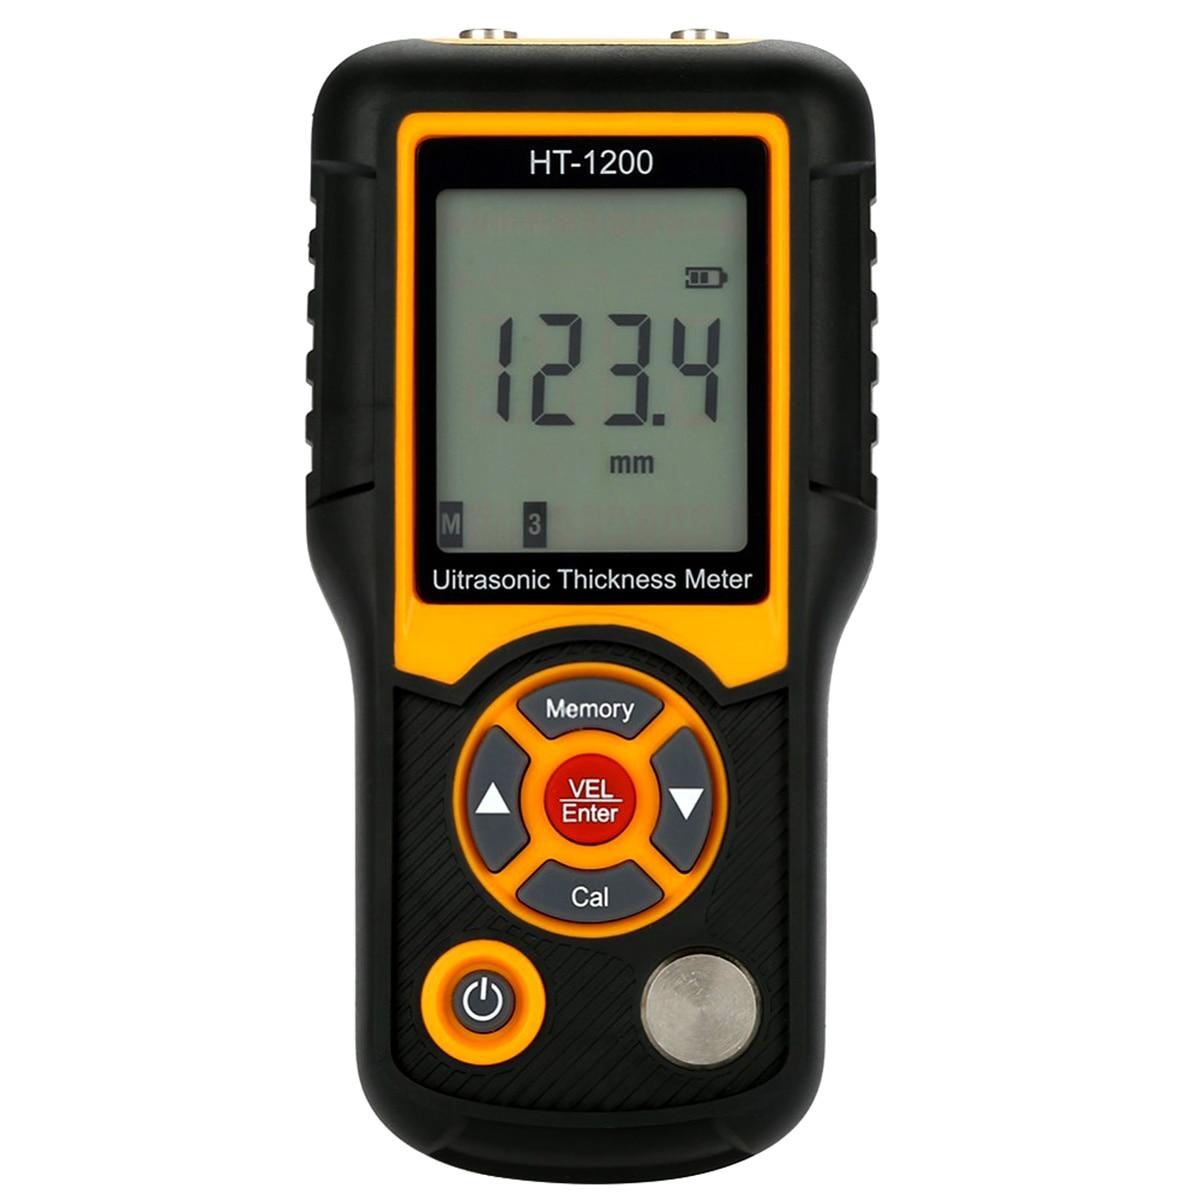 Hti HT-1200 Digital LCD Ultrasonic Thickness Meter Tester Gauge Measuring Tool Range1.2~225mm Hti HT-1200 Digital LCD Ultrasonic Thickness Meter Tester Gauge Measuring Tool Range1.2~225mm